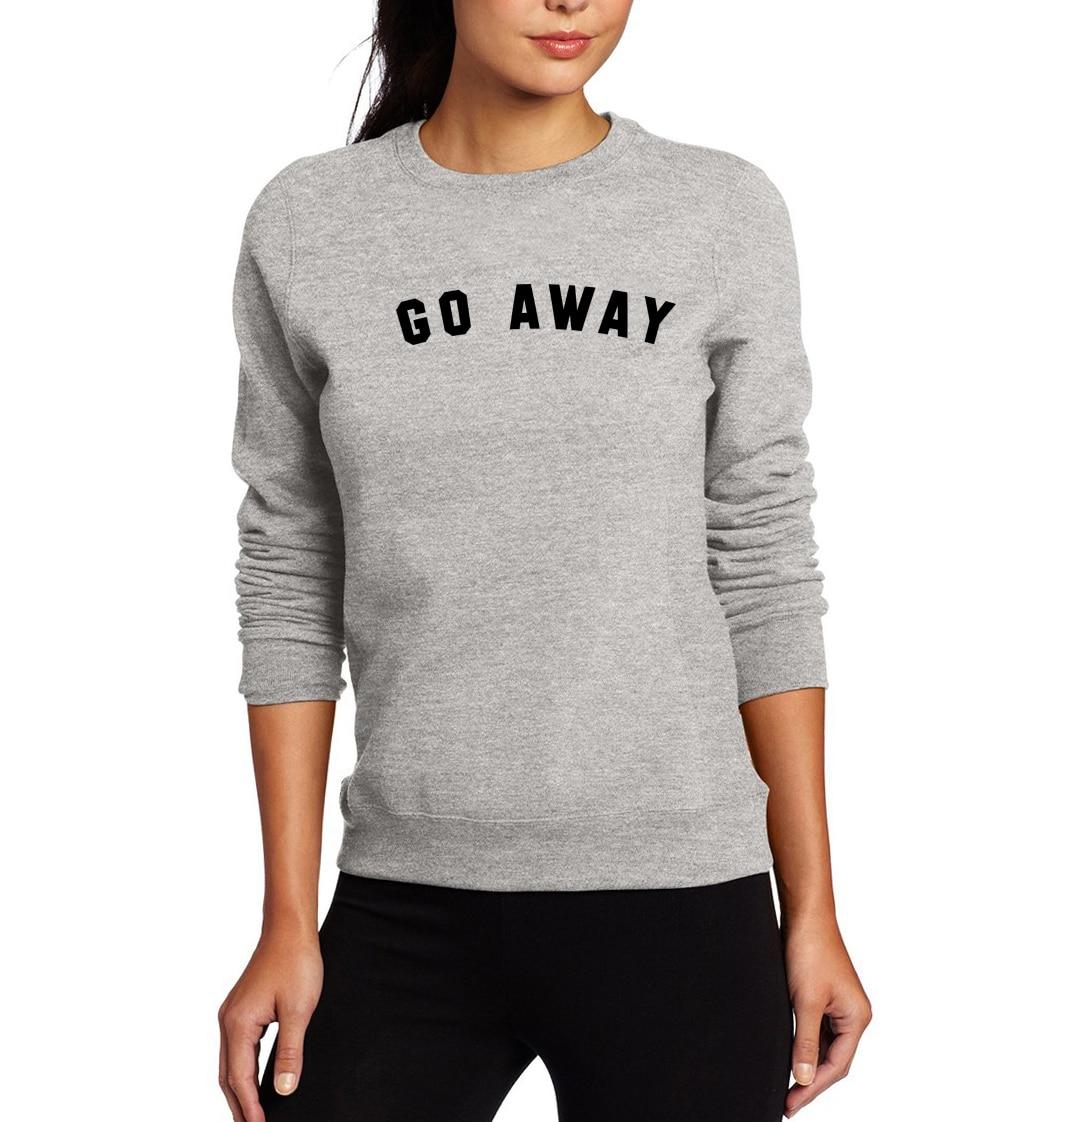 Sweatshirt For Women Printed Go Away Hoodies 2019 Spring Winter Fleece Pulllover Female Sweatshirts Kpop Casual Hot Tracksuits